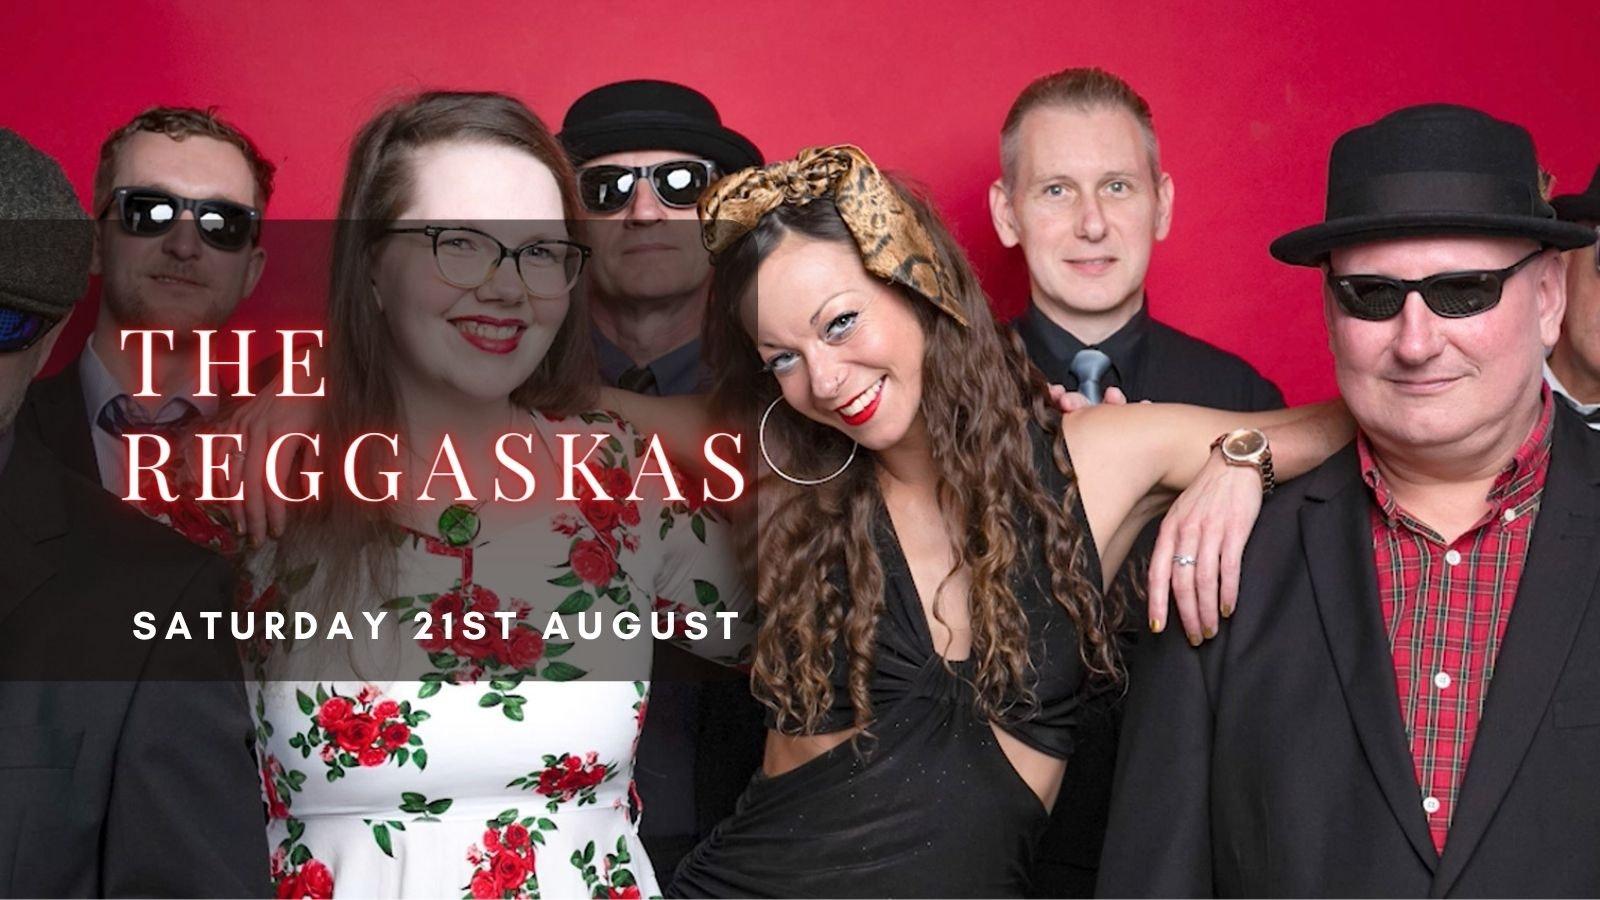 THE REGGASKAS   Plymouth, Annabel's Cabaret & Discotheque